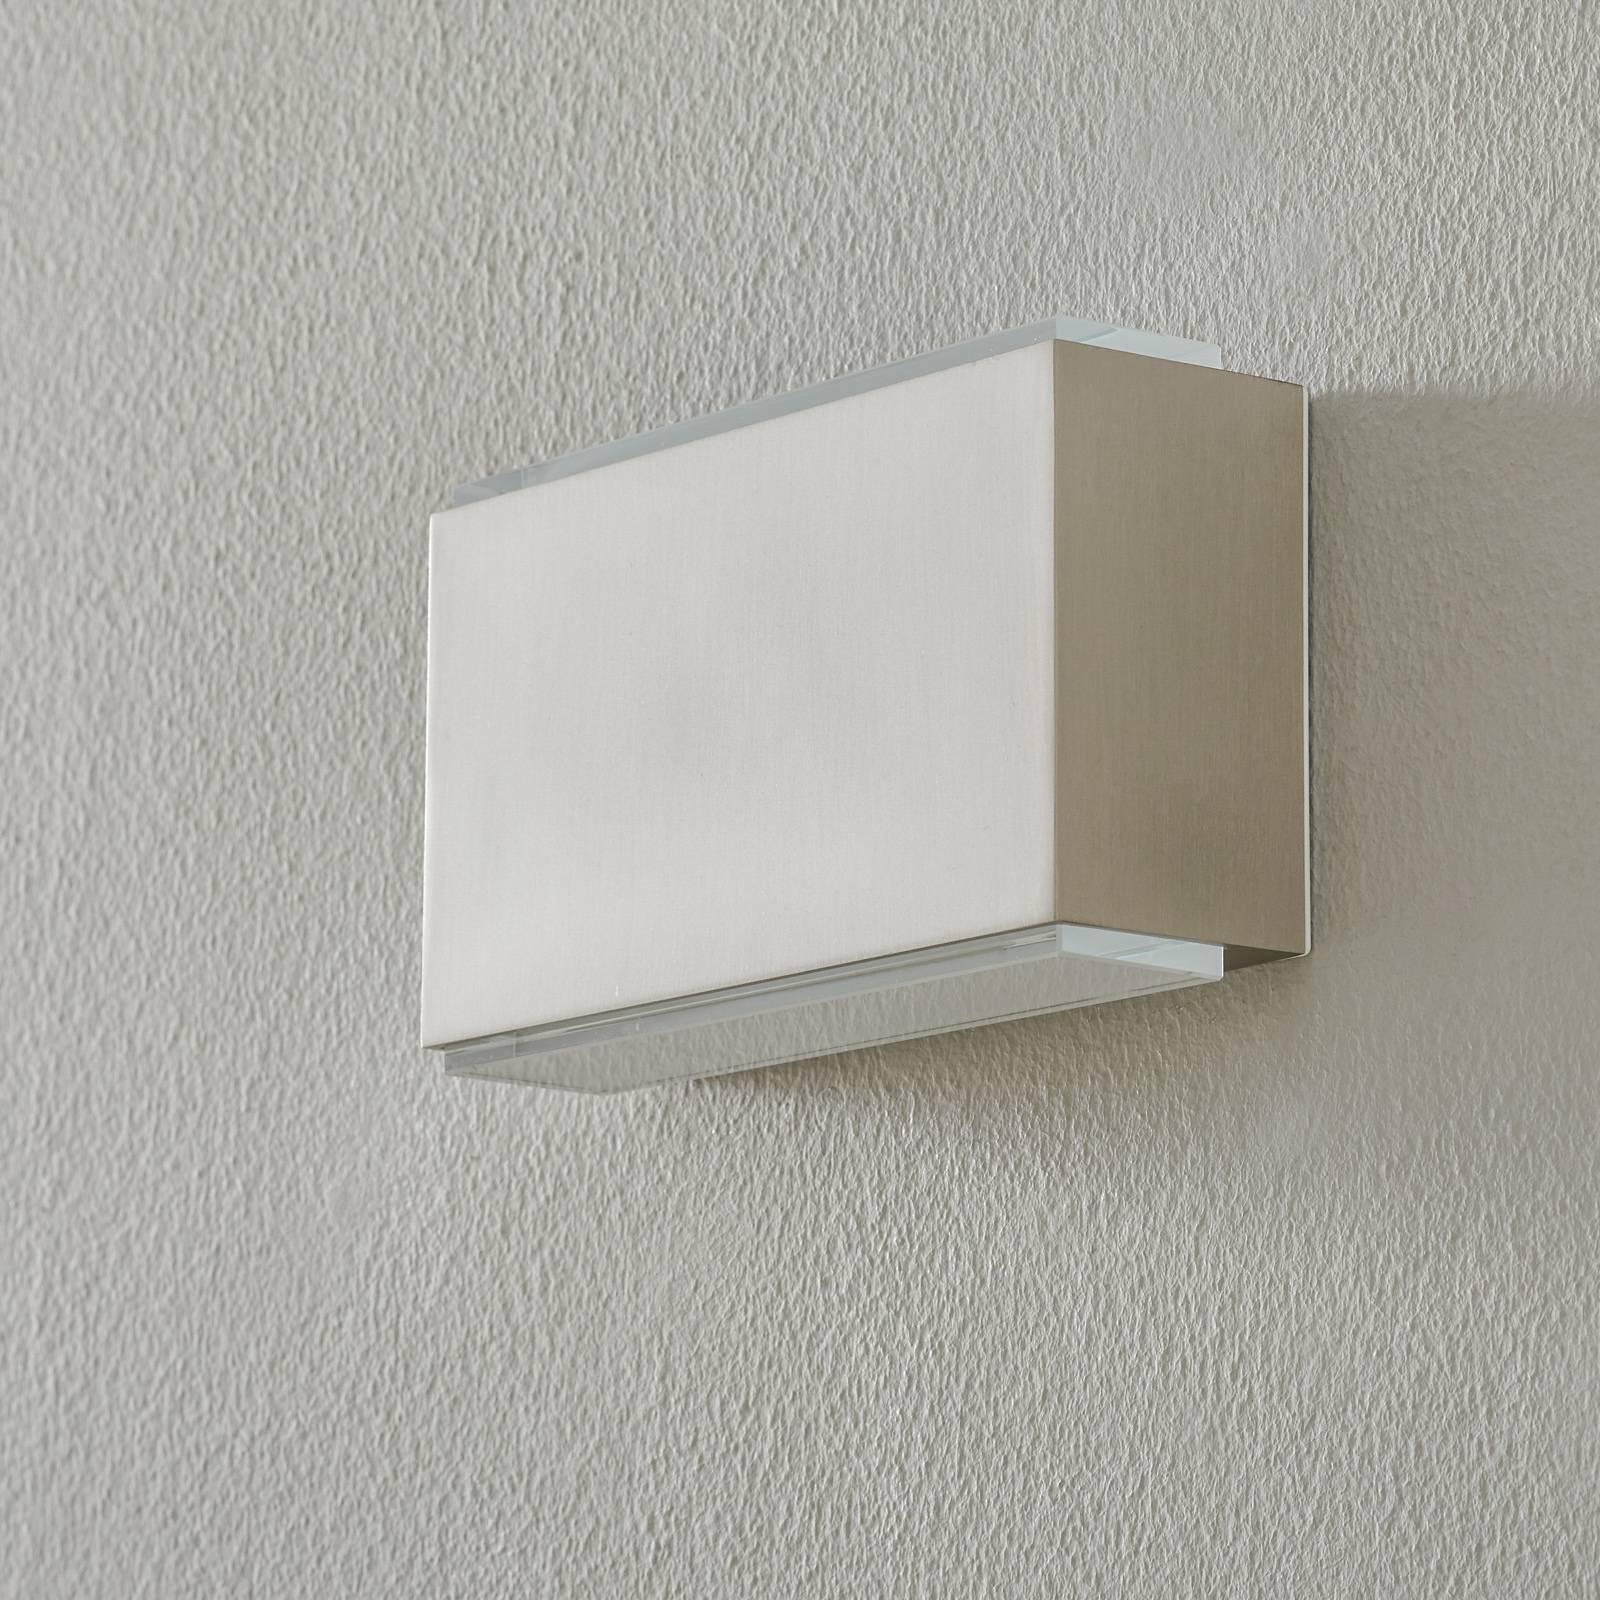 BEGA 23015 LED-seinälamppu 3000K 18cm teräs 1260lm